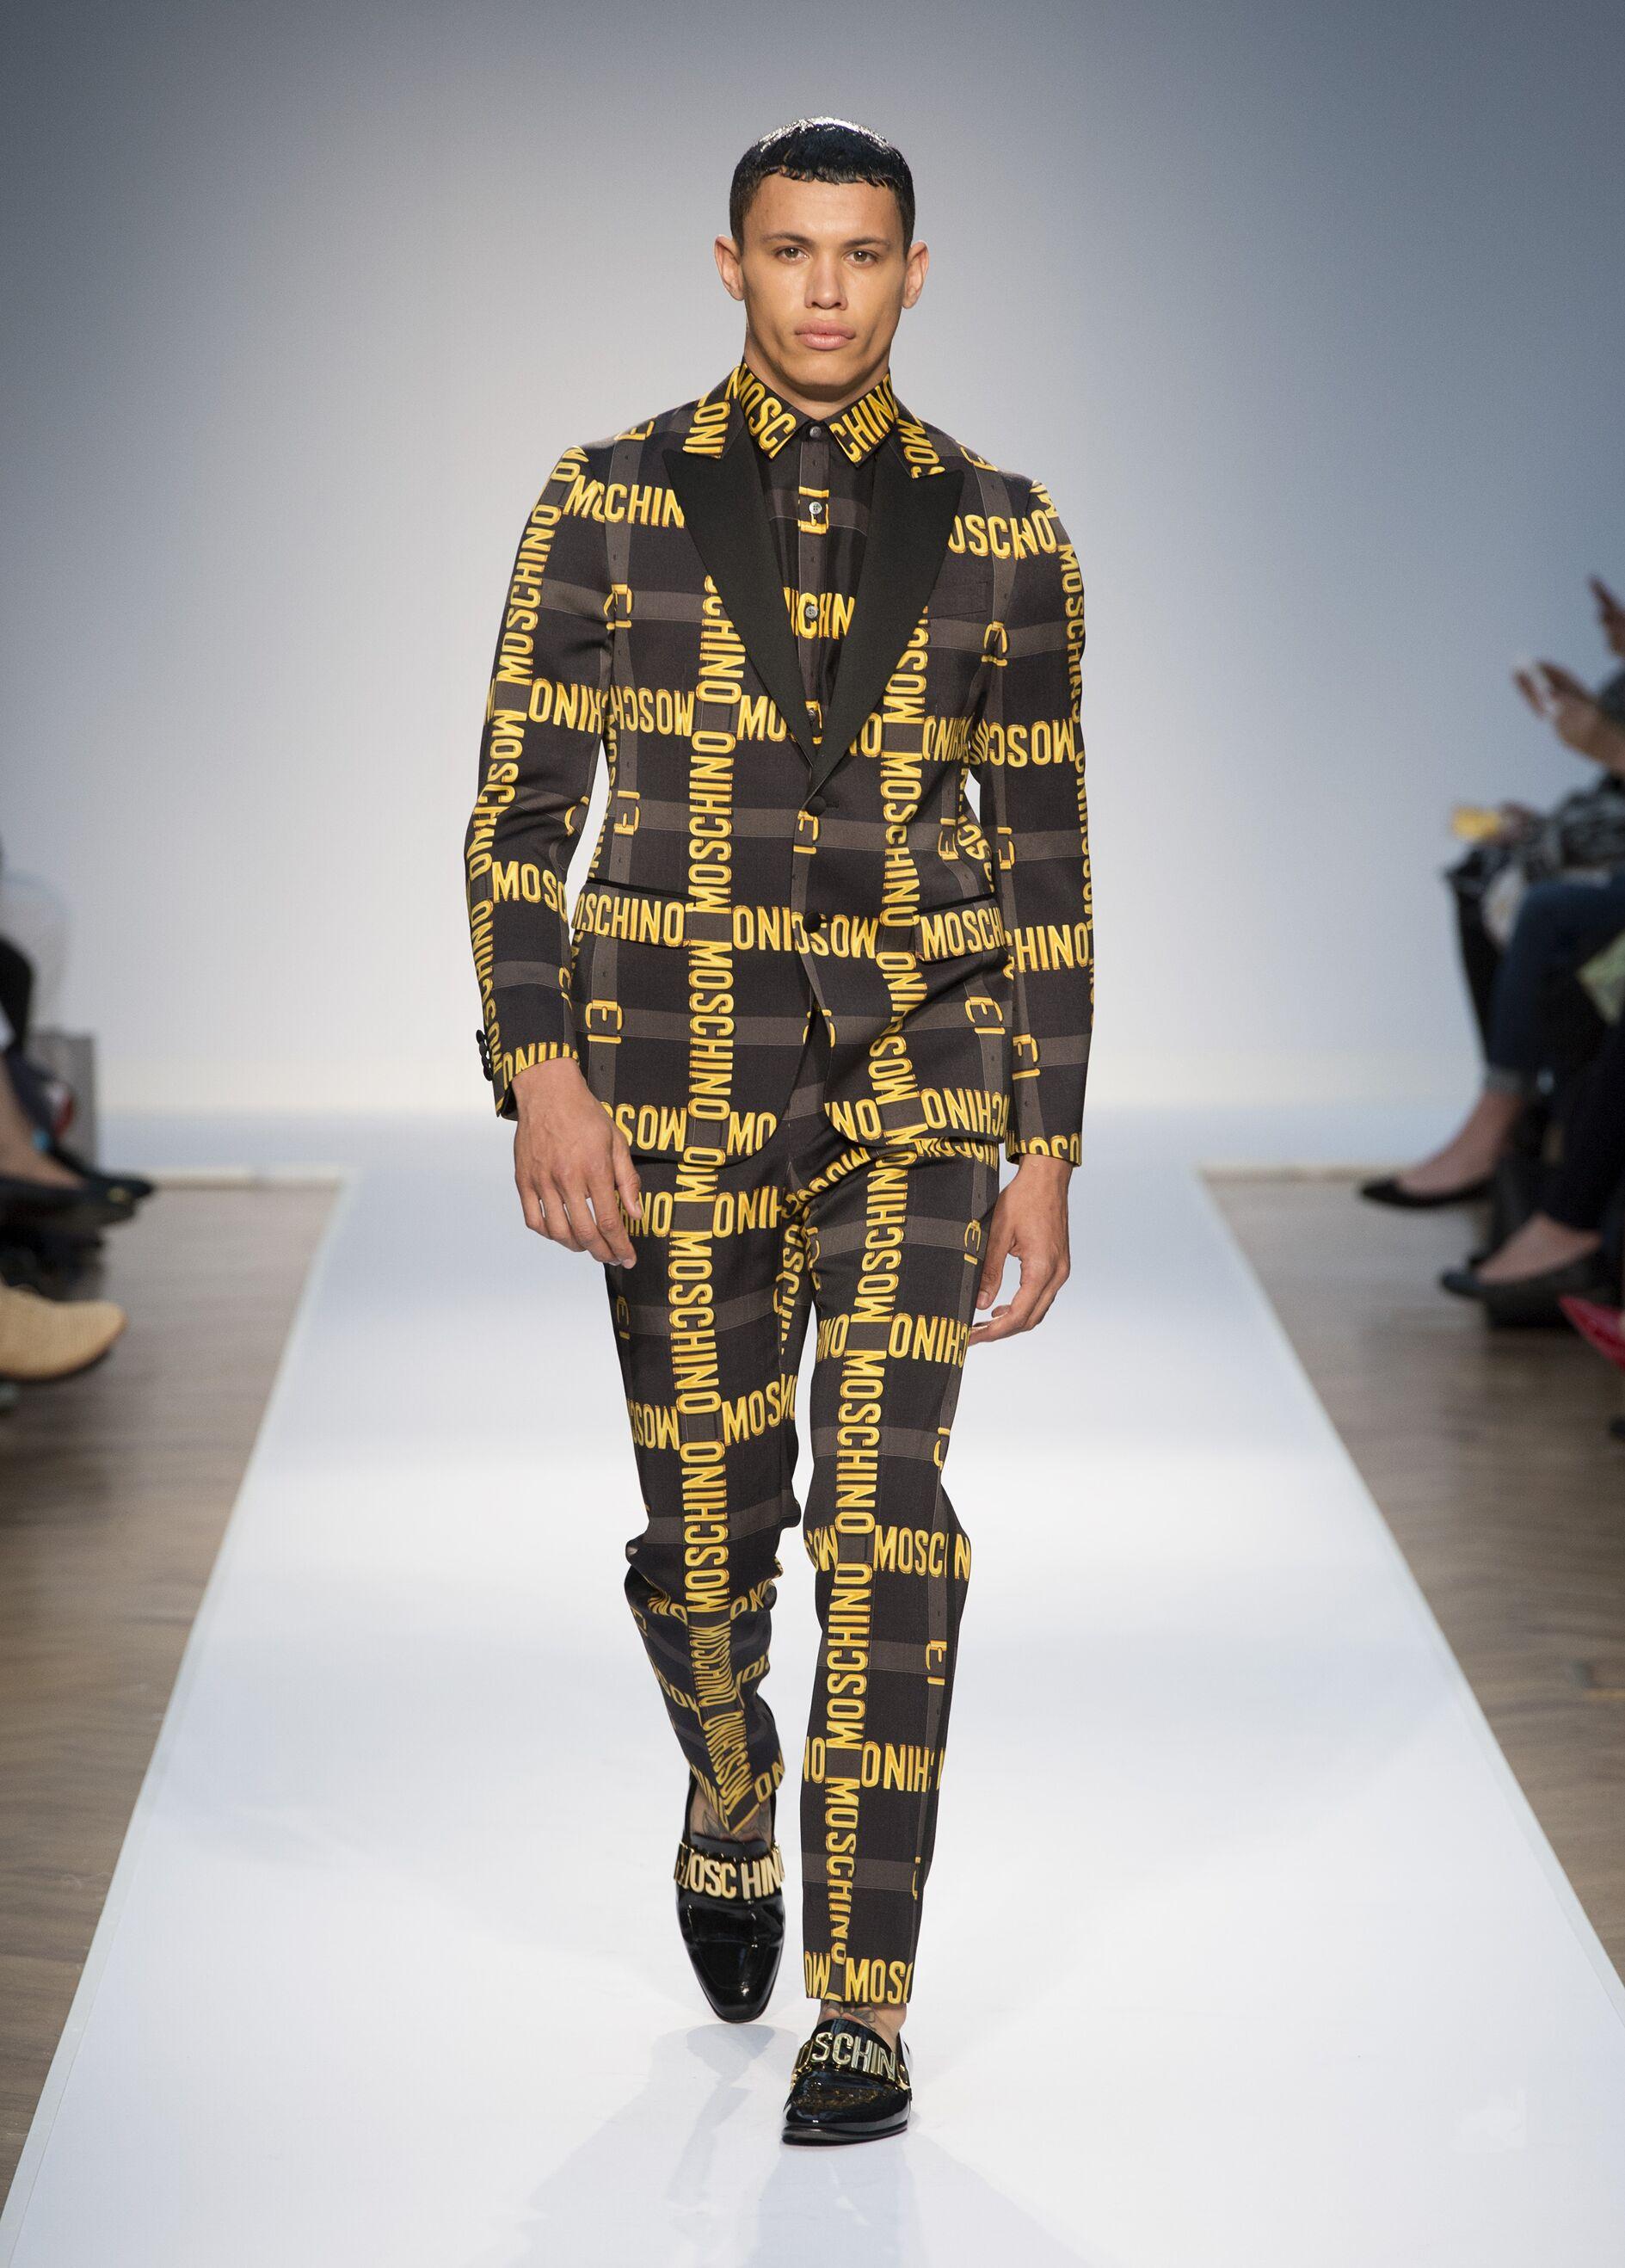 Jeremy Scott Moschino Man Fashion Show Summer 2015